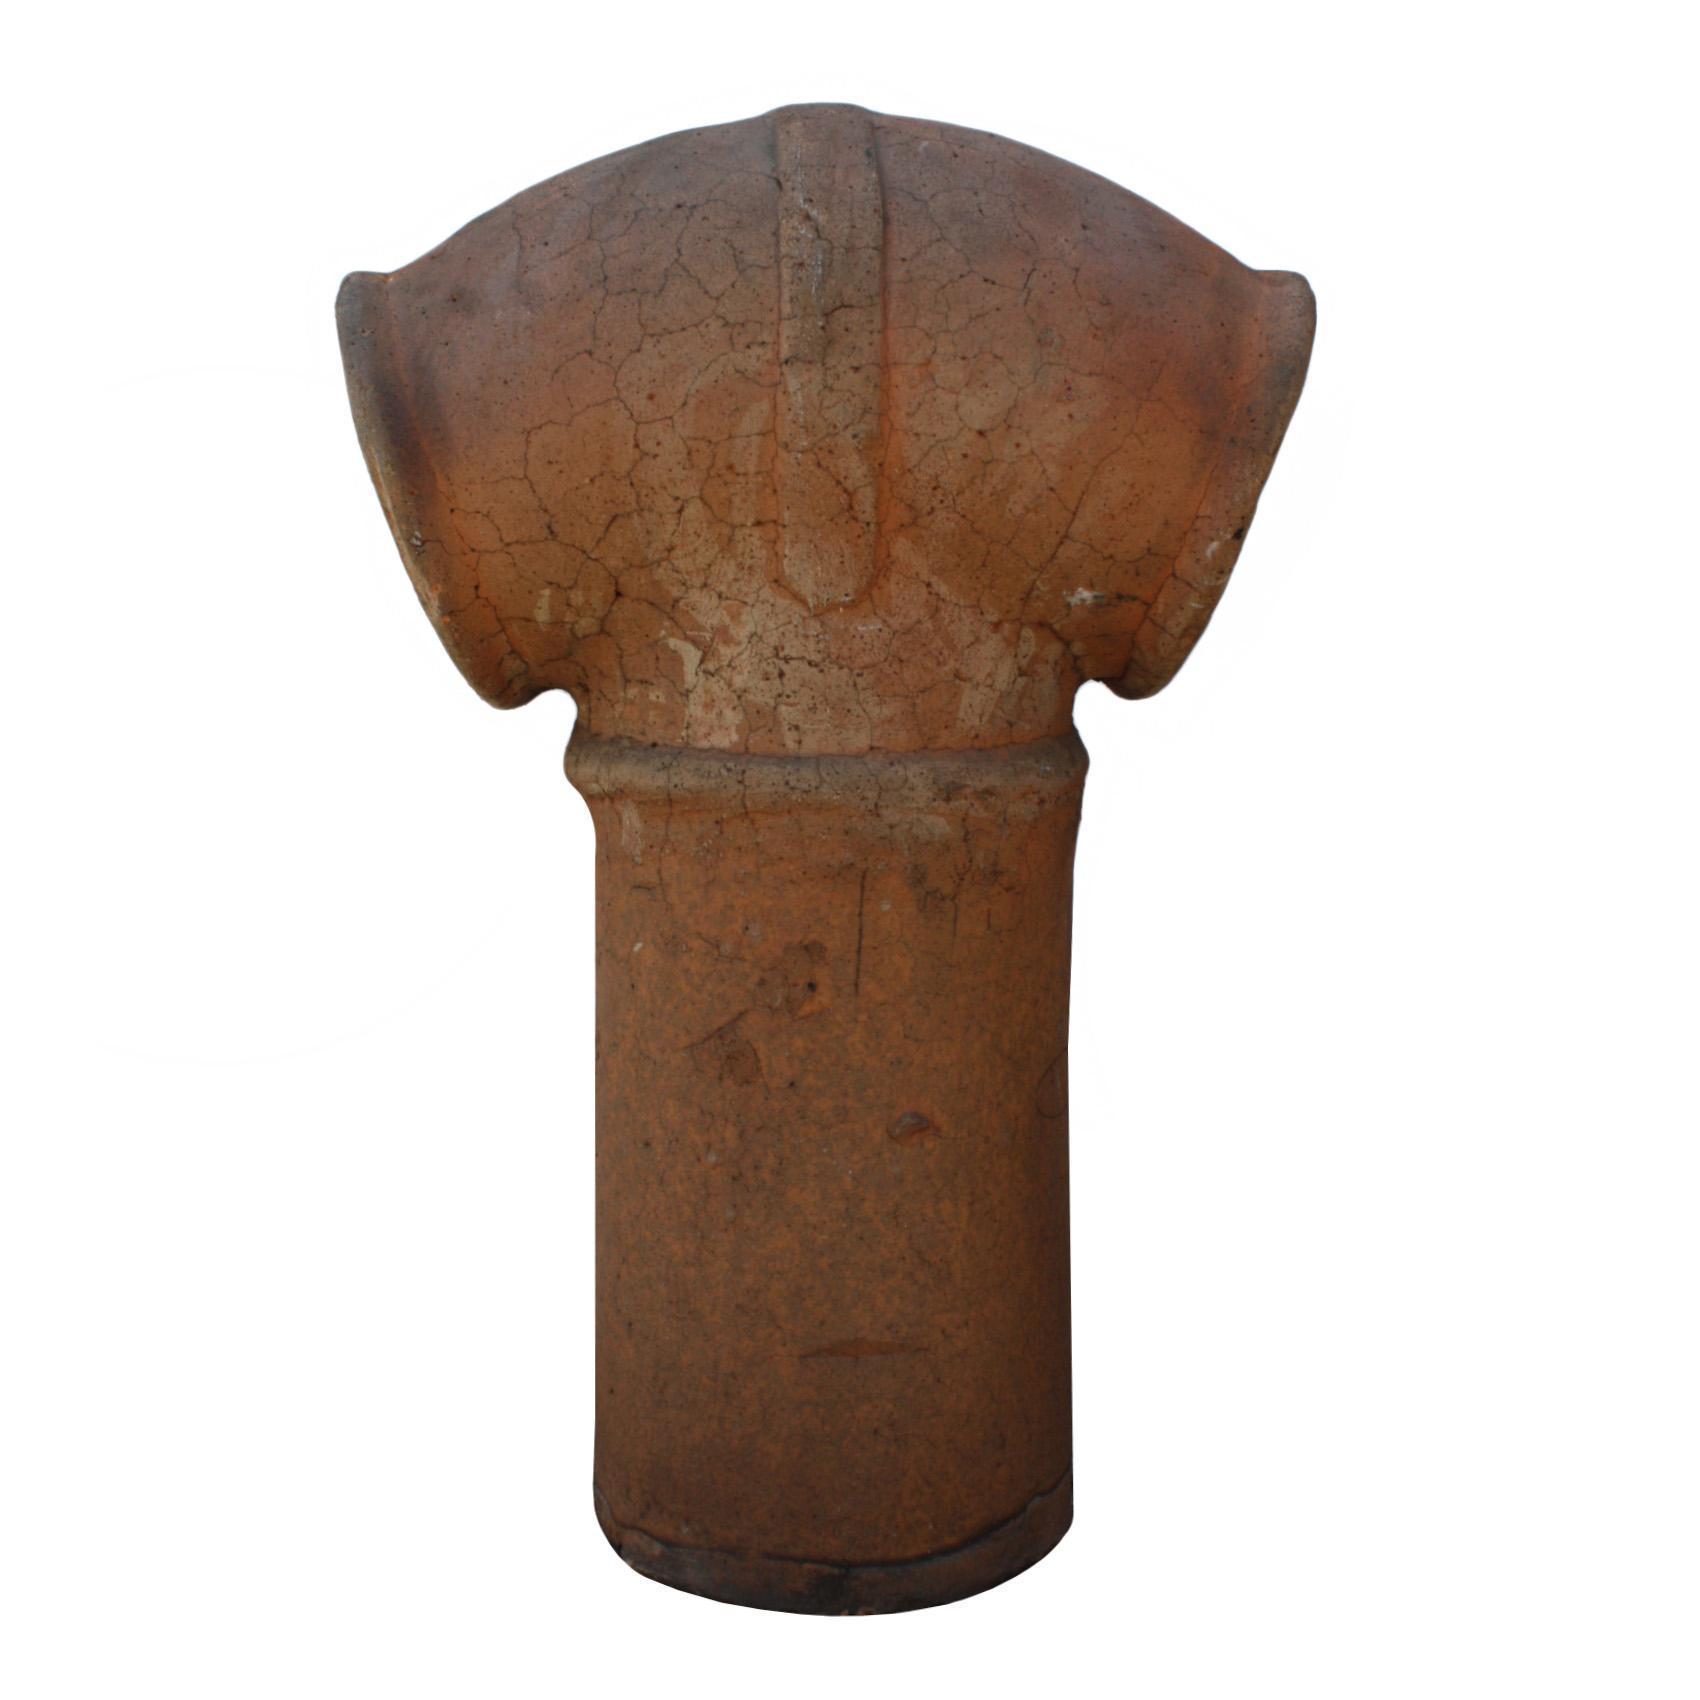 Wonderful Antique Terra Cotta Chimney Pot, Early 1900's